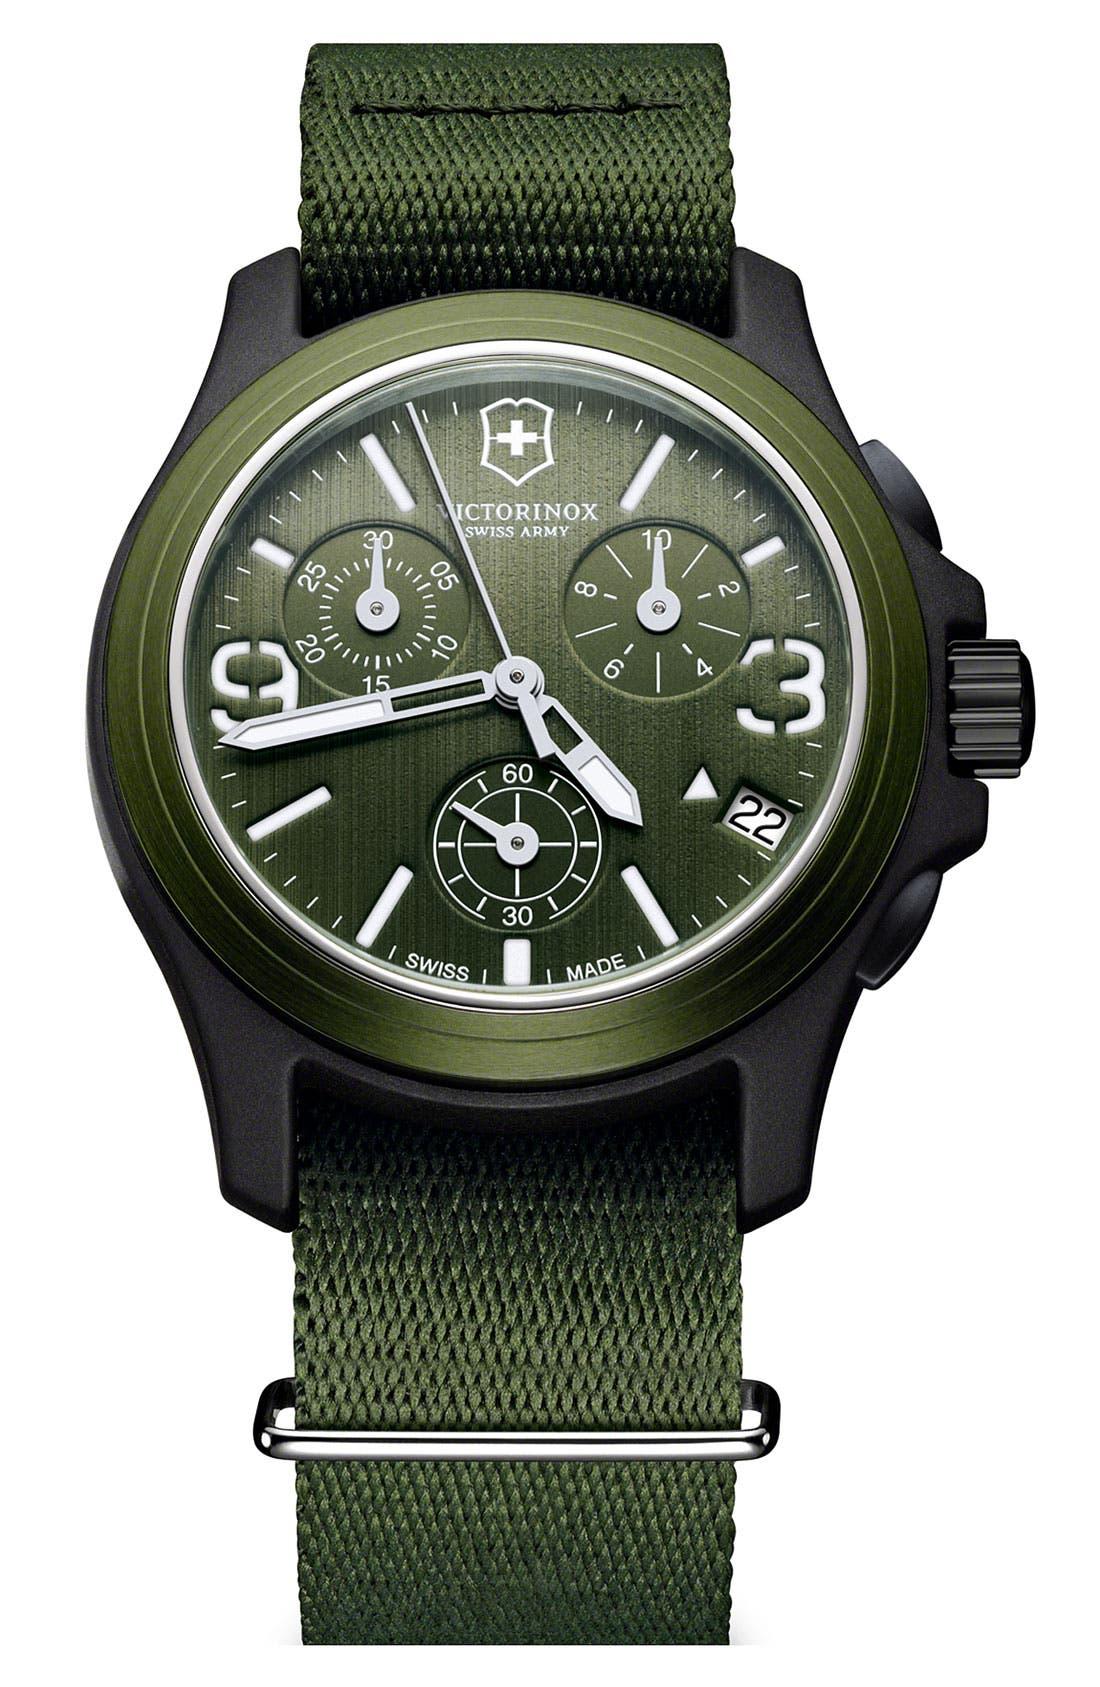 Main Image - Victorinox Swiss Army® 'Original' Chronograph Watch, 40mm